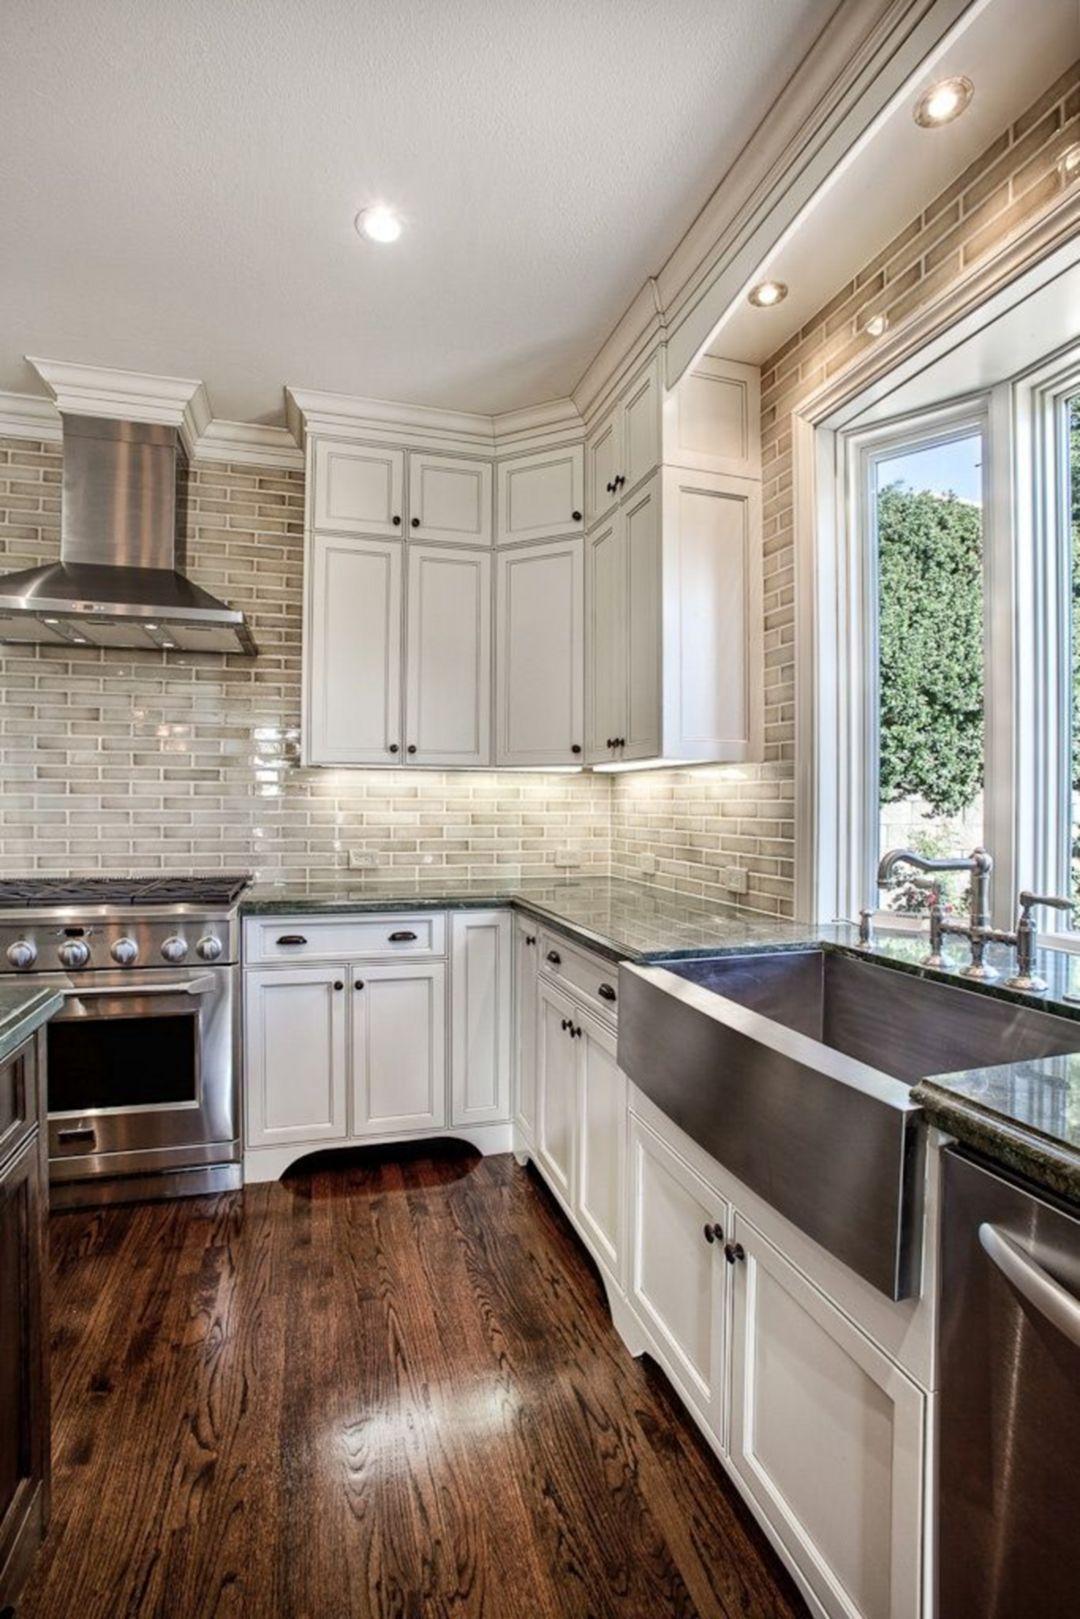 amazing wooden kitchen floor design ideas kitchen idea